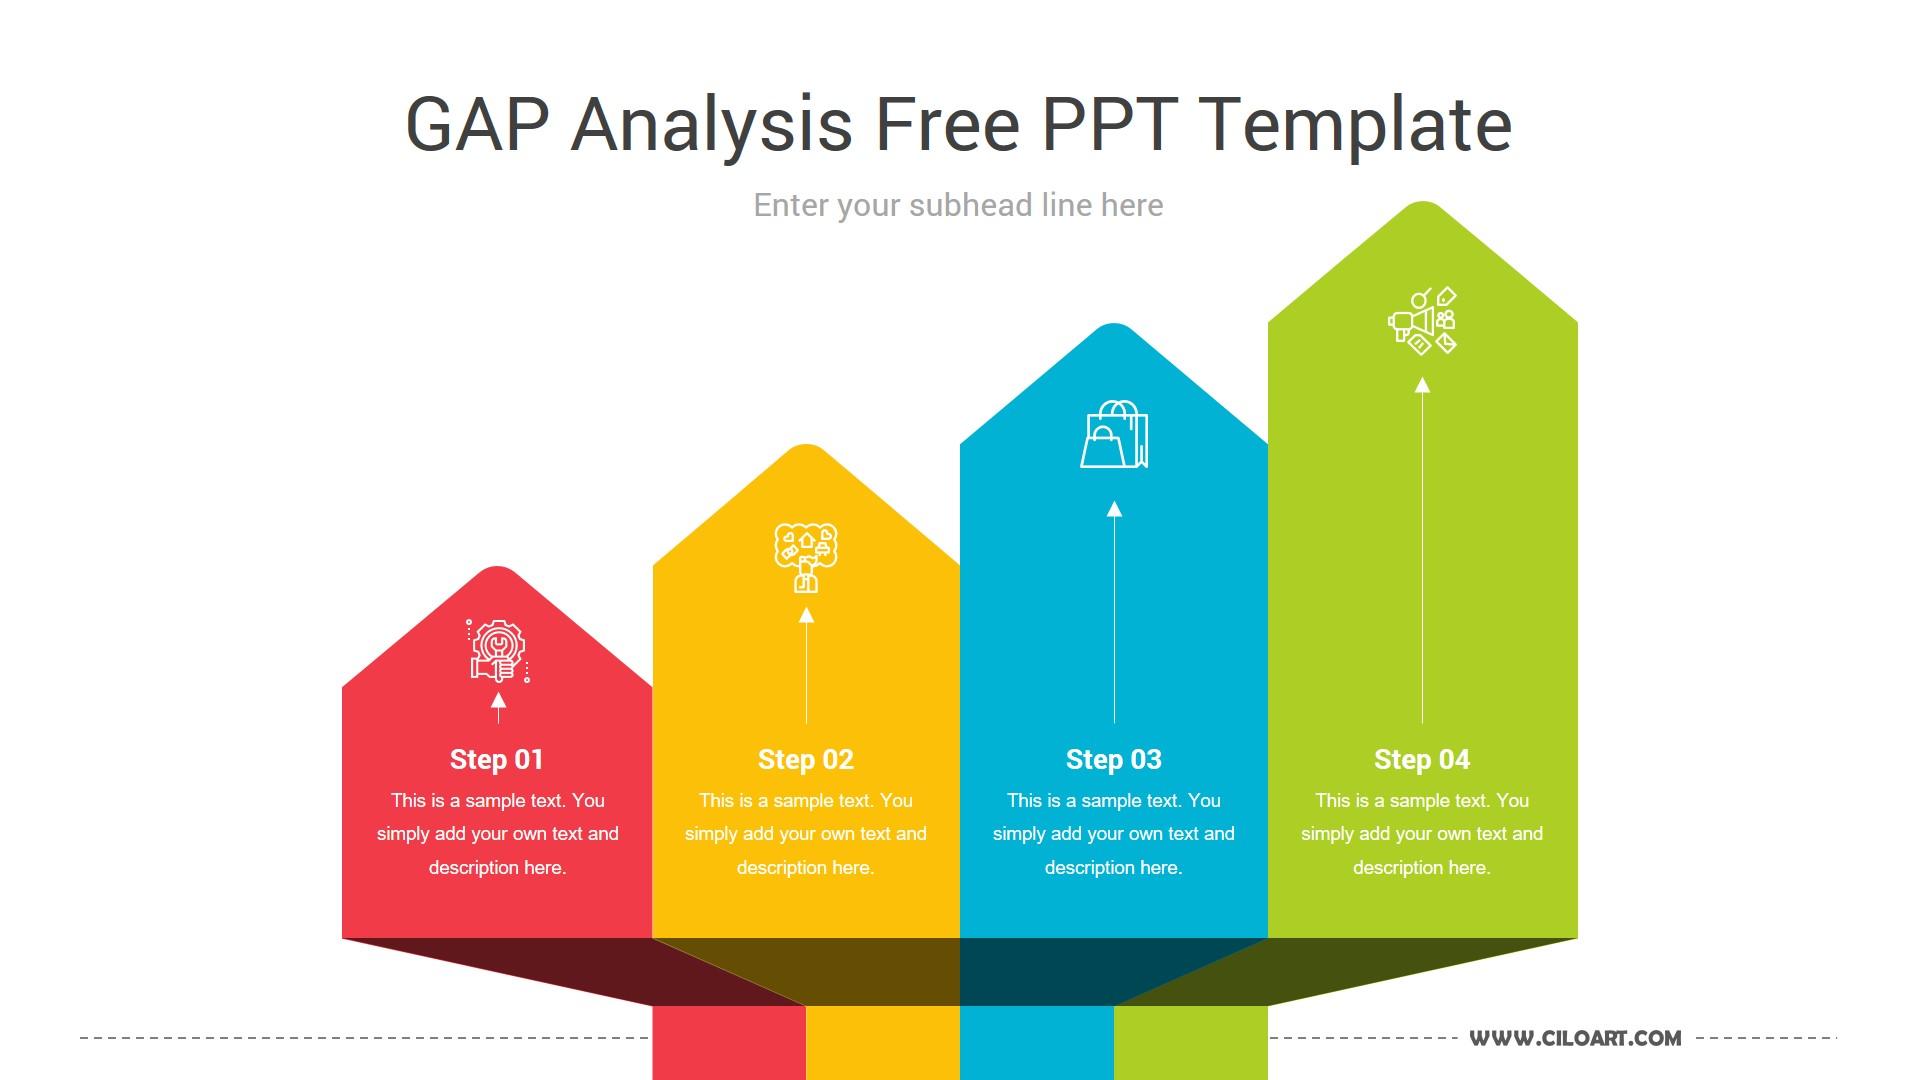 Gap Analysis Free PPT Template